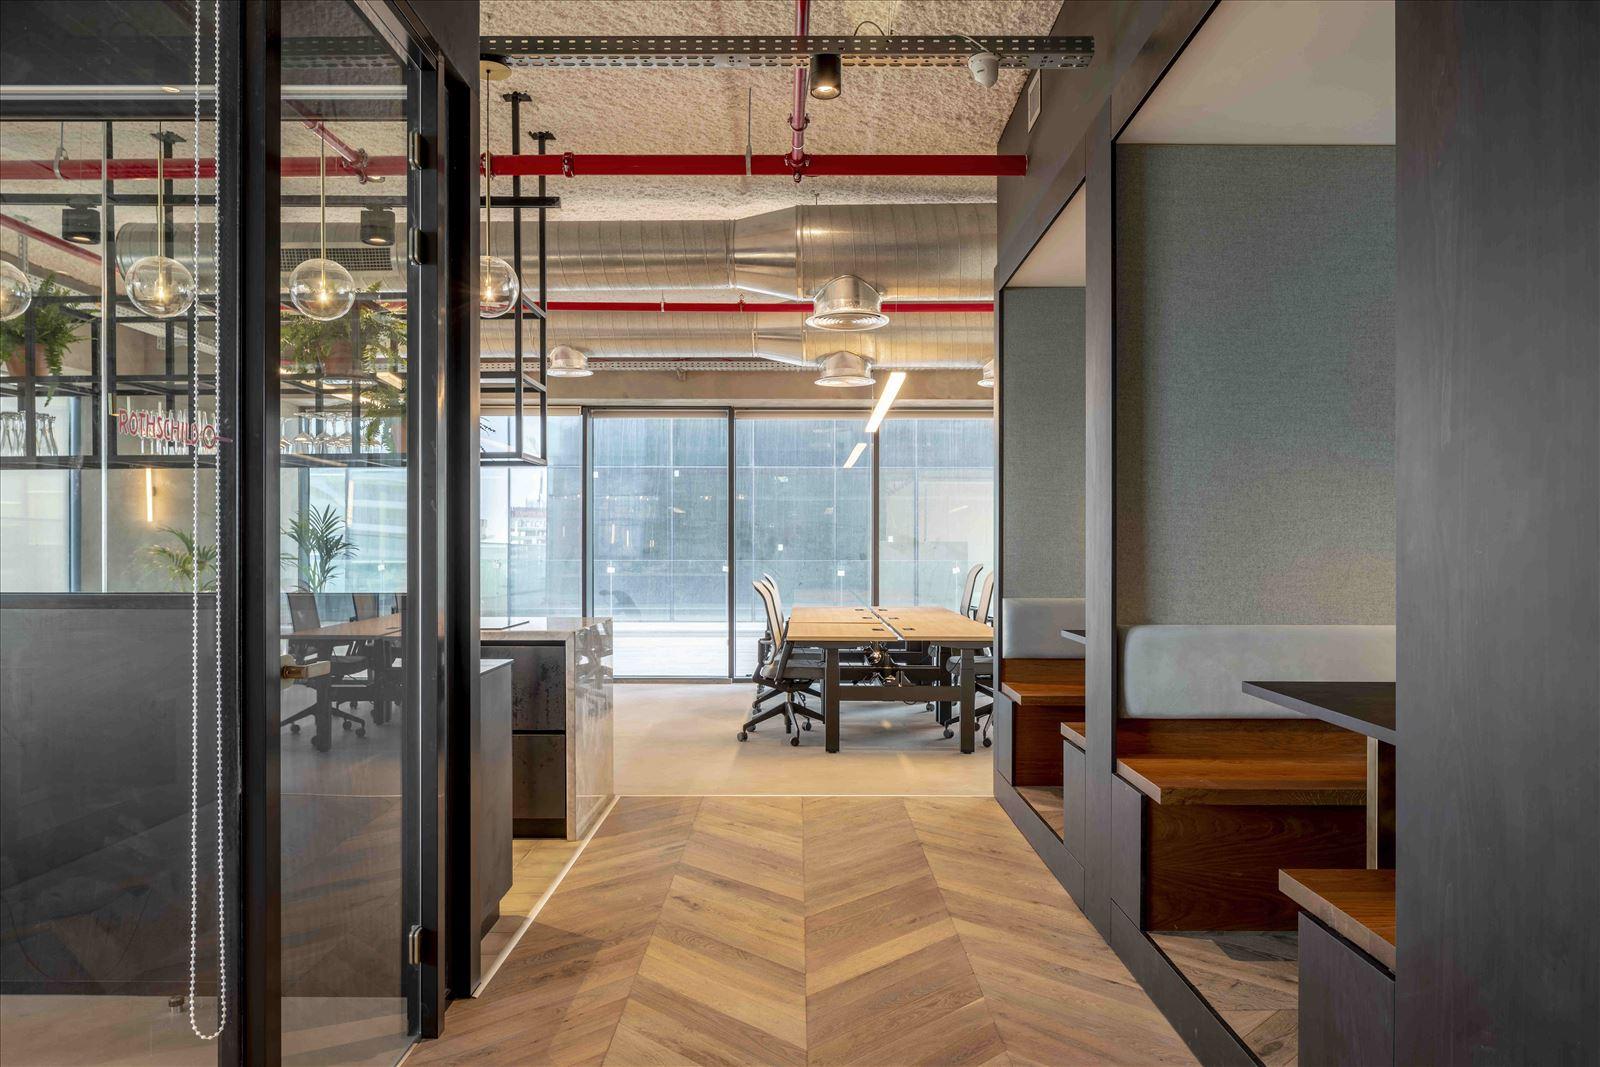 Office project התאורה בחלל המשרד נעשתה על ידי קמחי תאורה